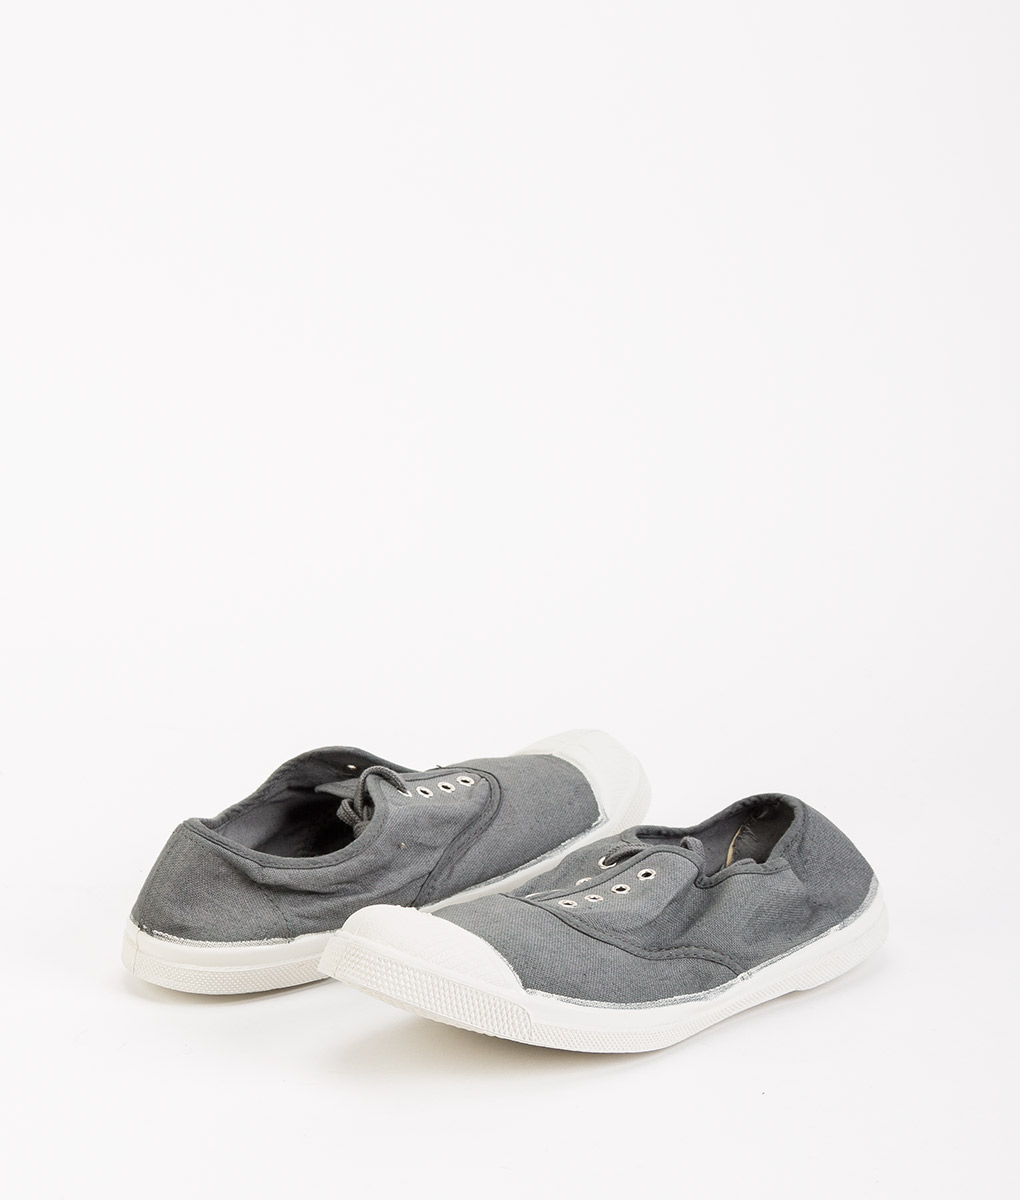 BENSIMON Women Sneakers 15004 TENNIS LACE, Gray 34.99 1